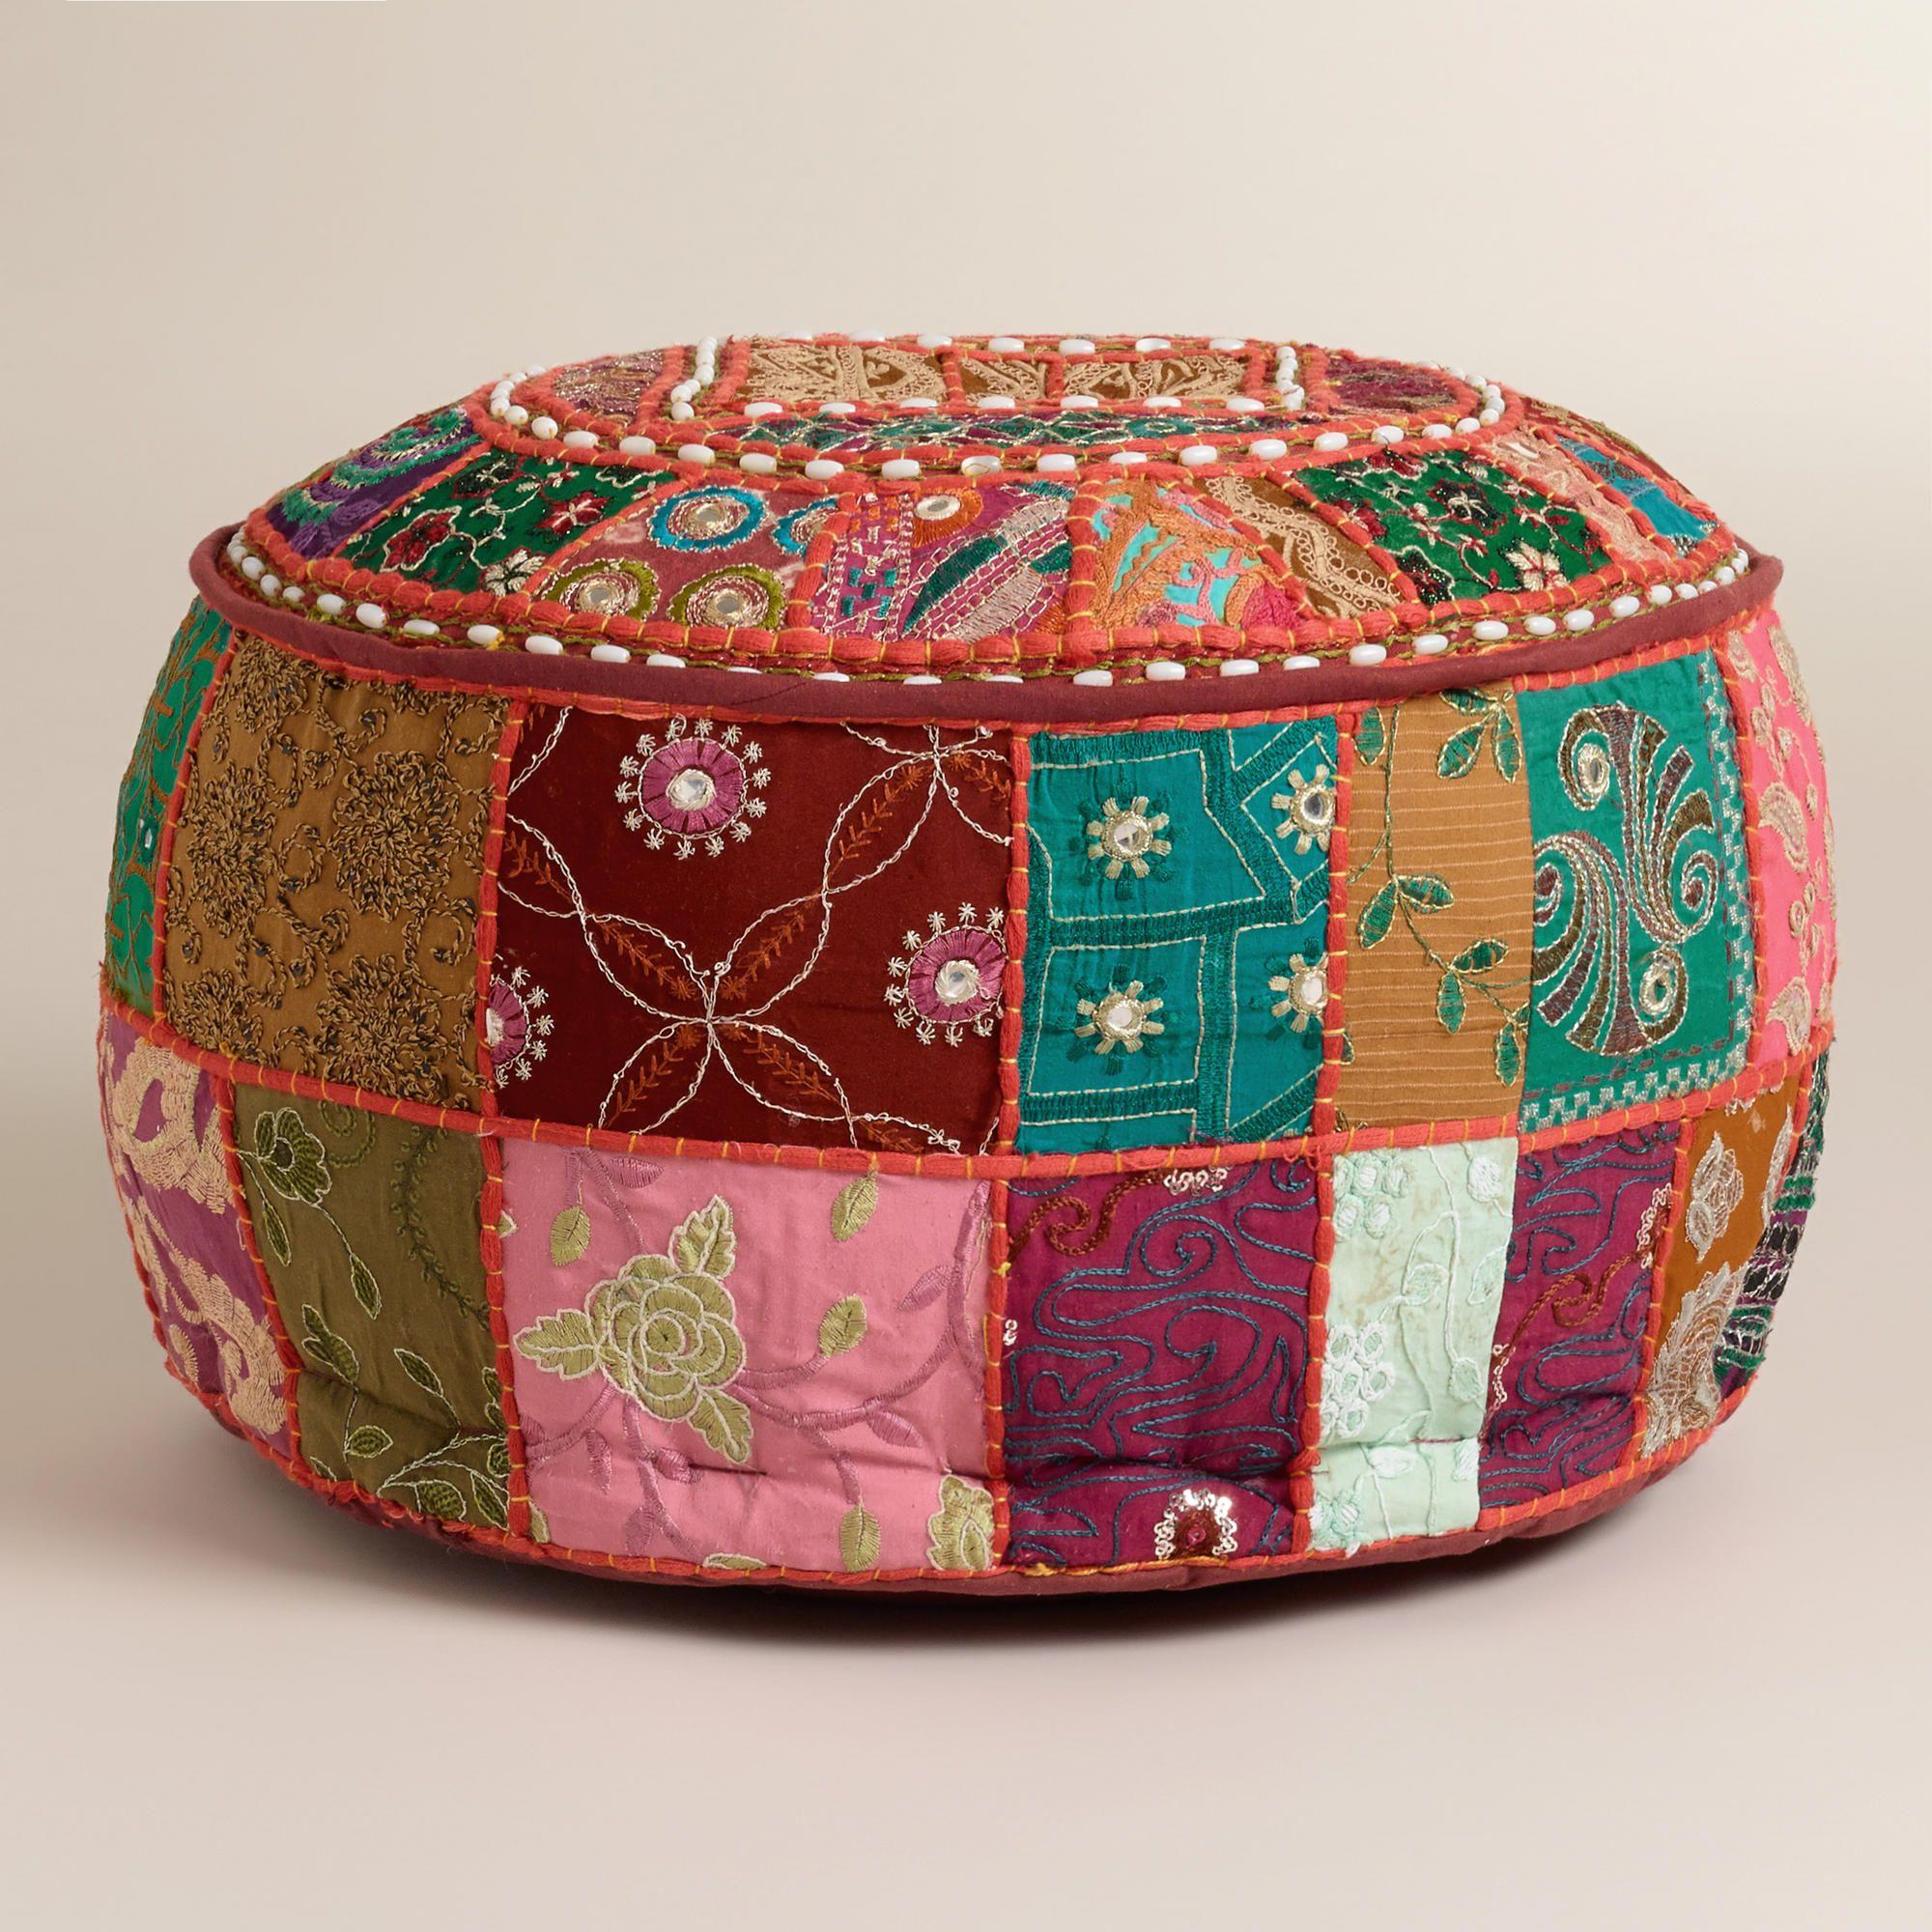 Red Suti Pouf | World Market | HOME ◈ Eclectic Decor | Pinterest ...